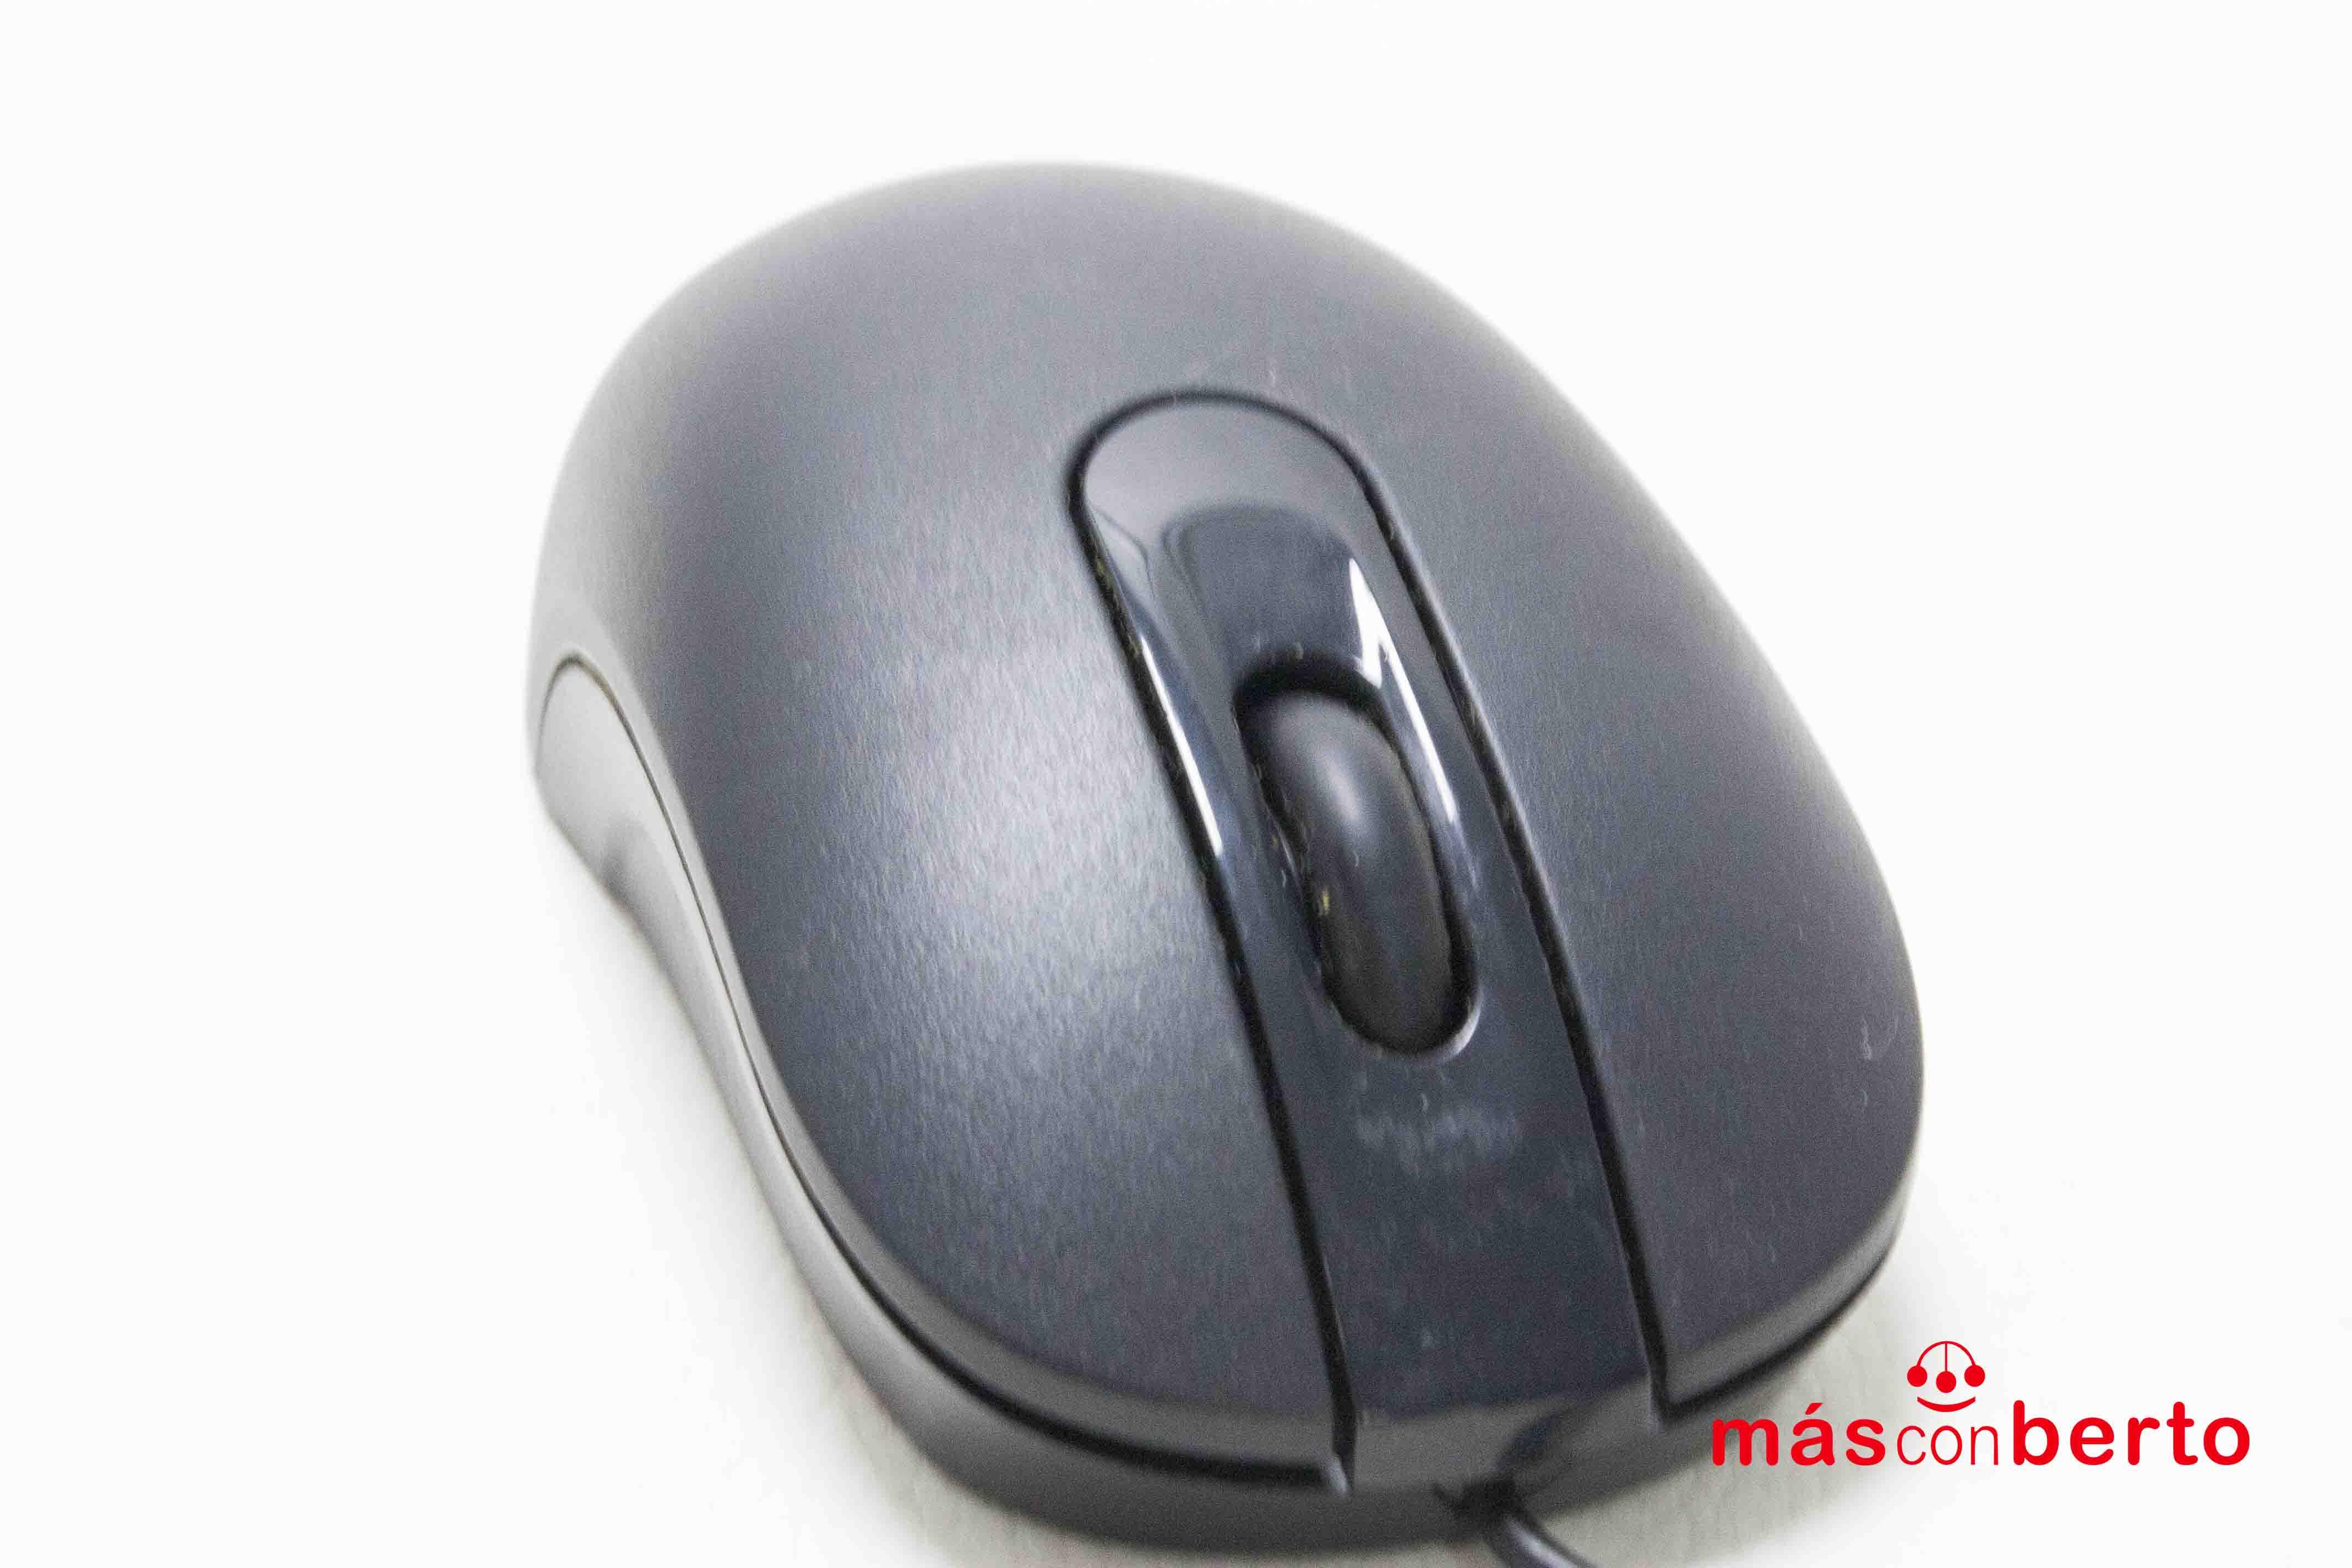 Ratón USB en color negro